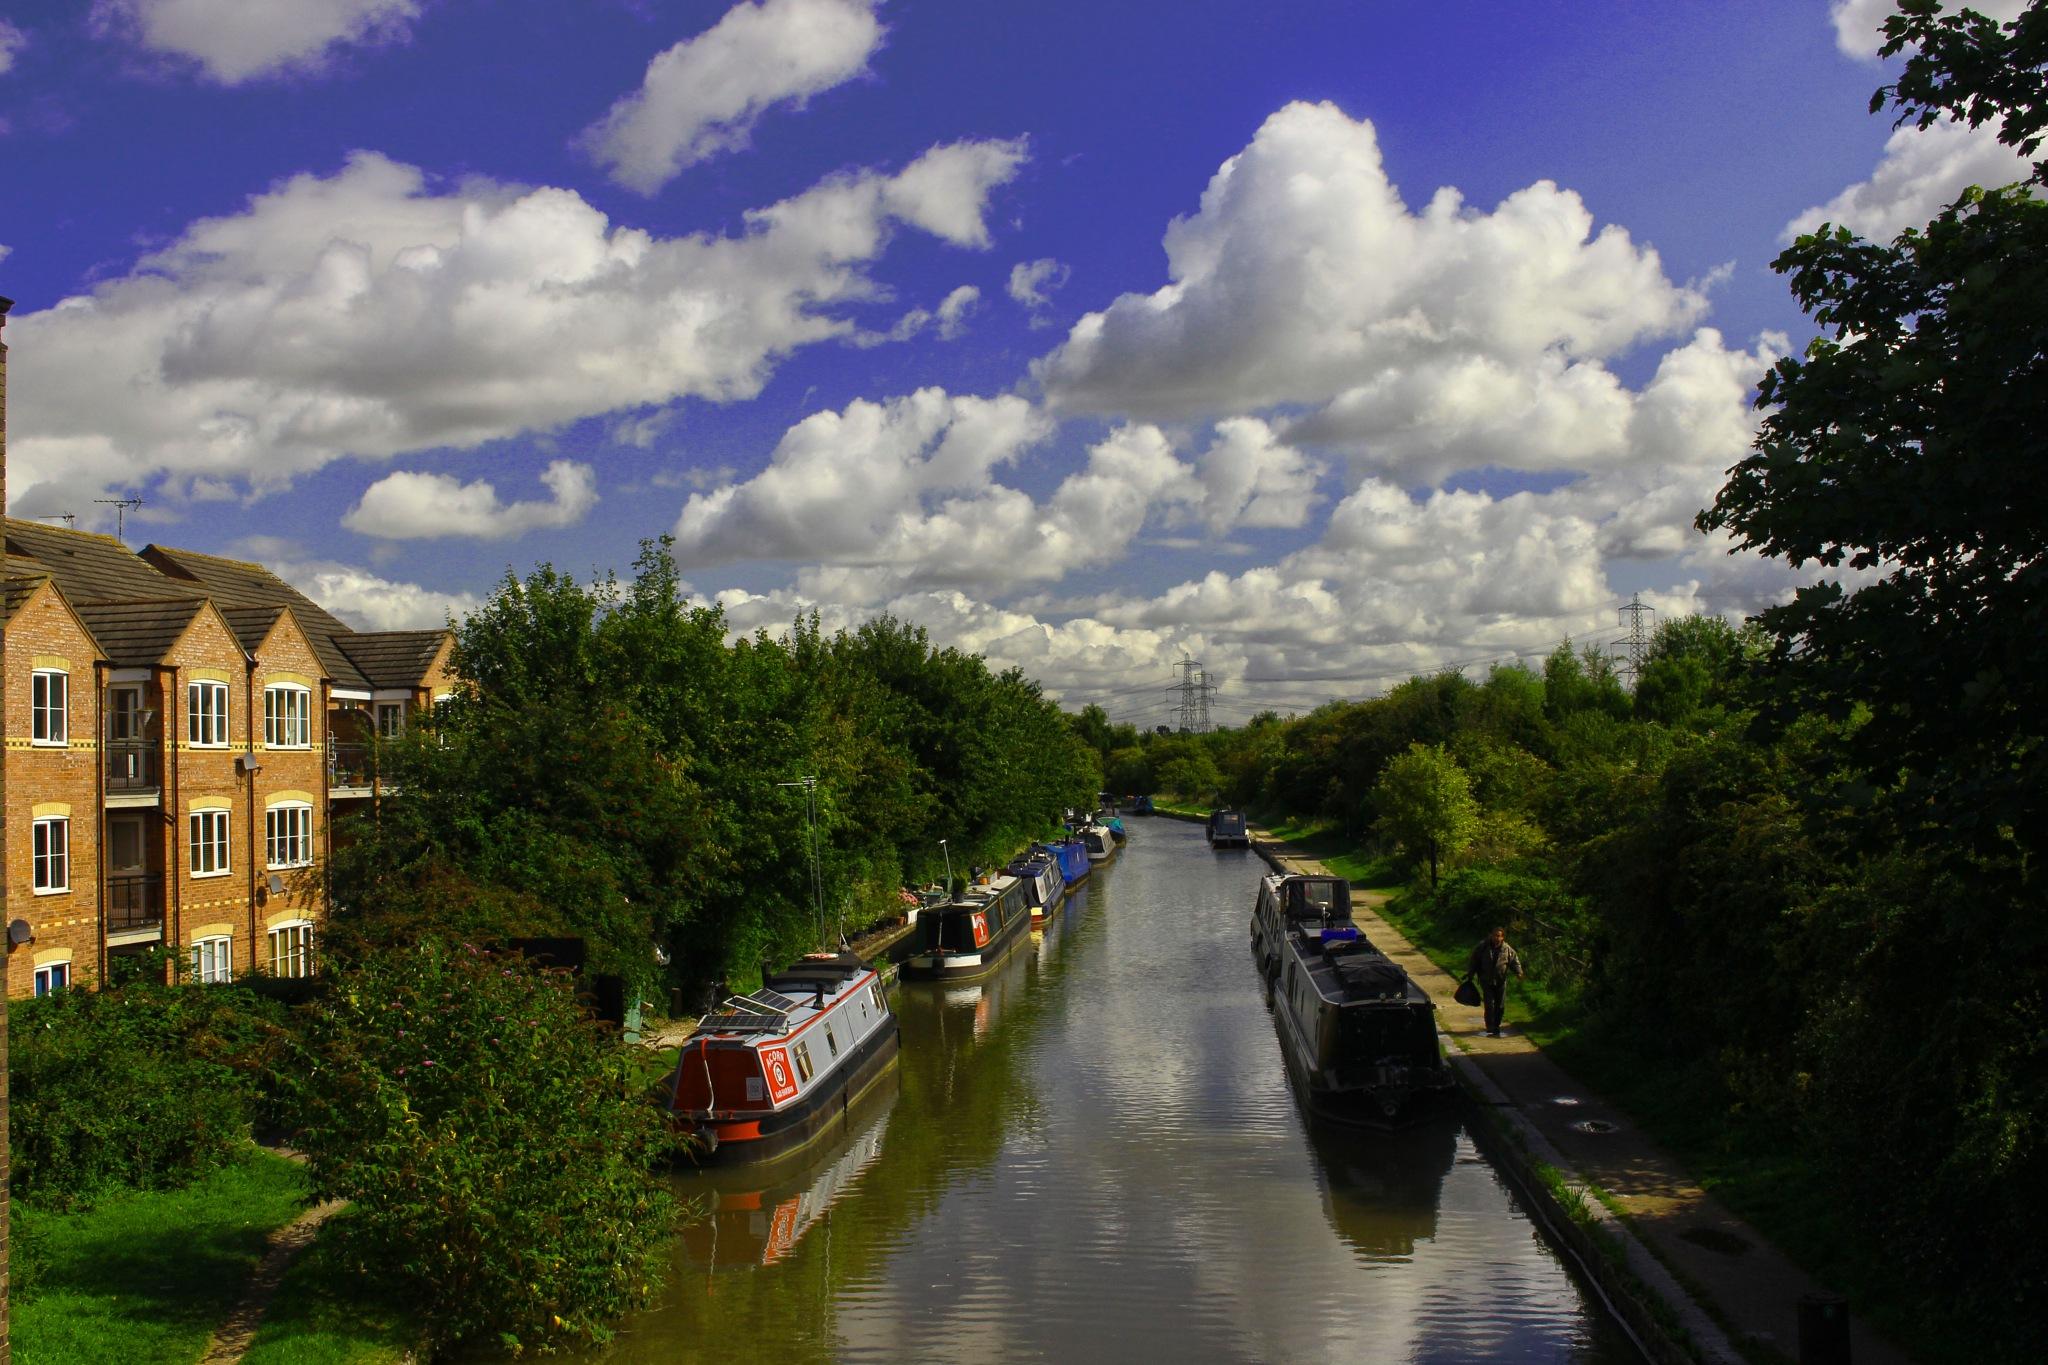 An English Canal Life by Mark Pemberton